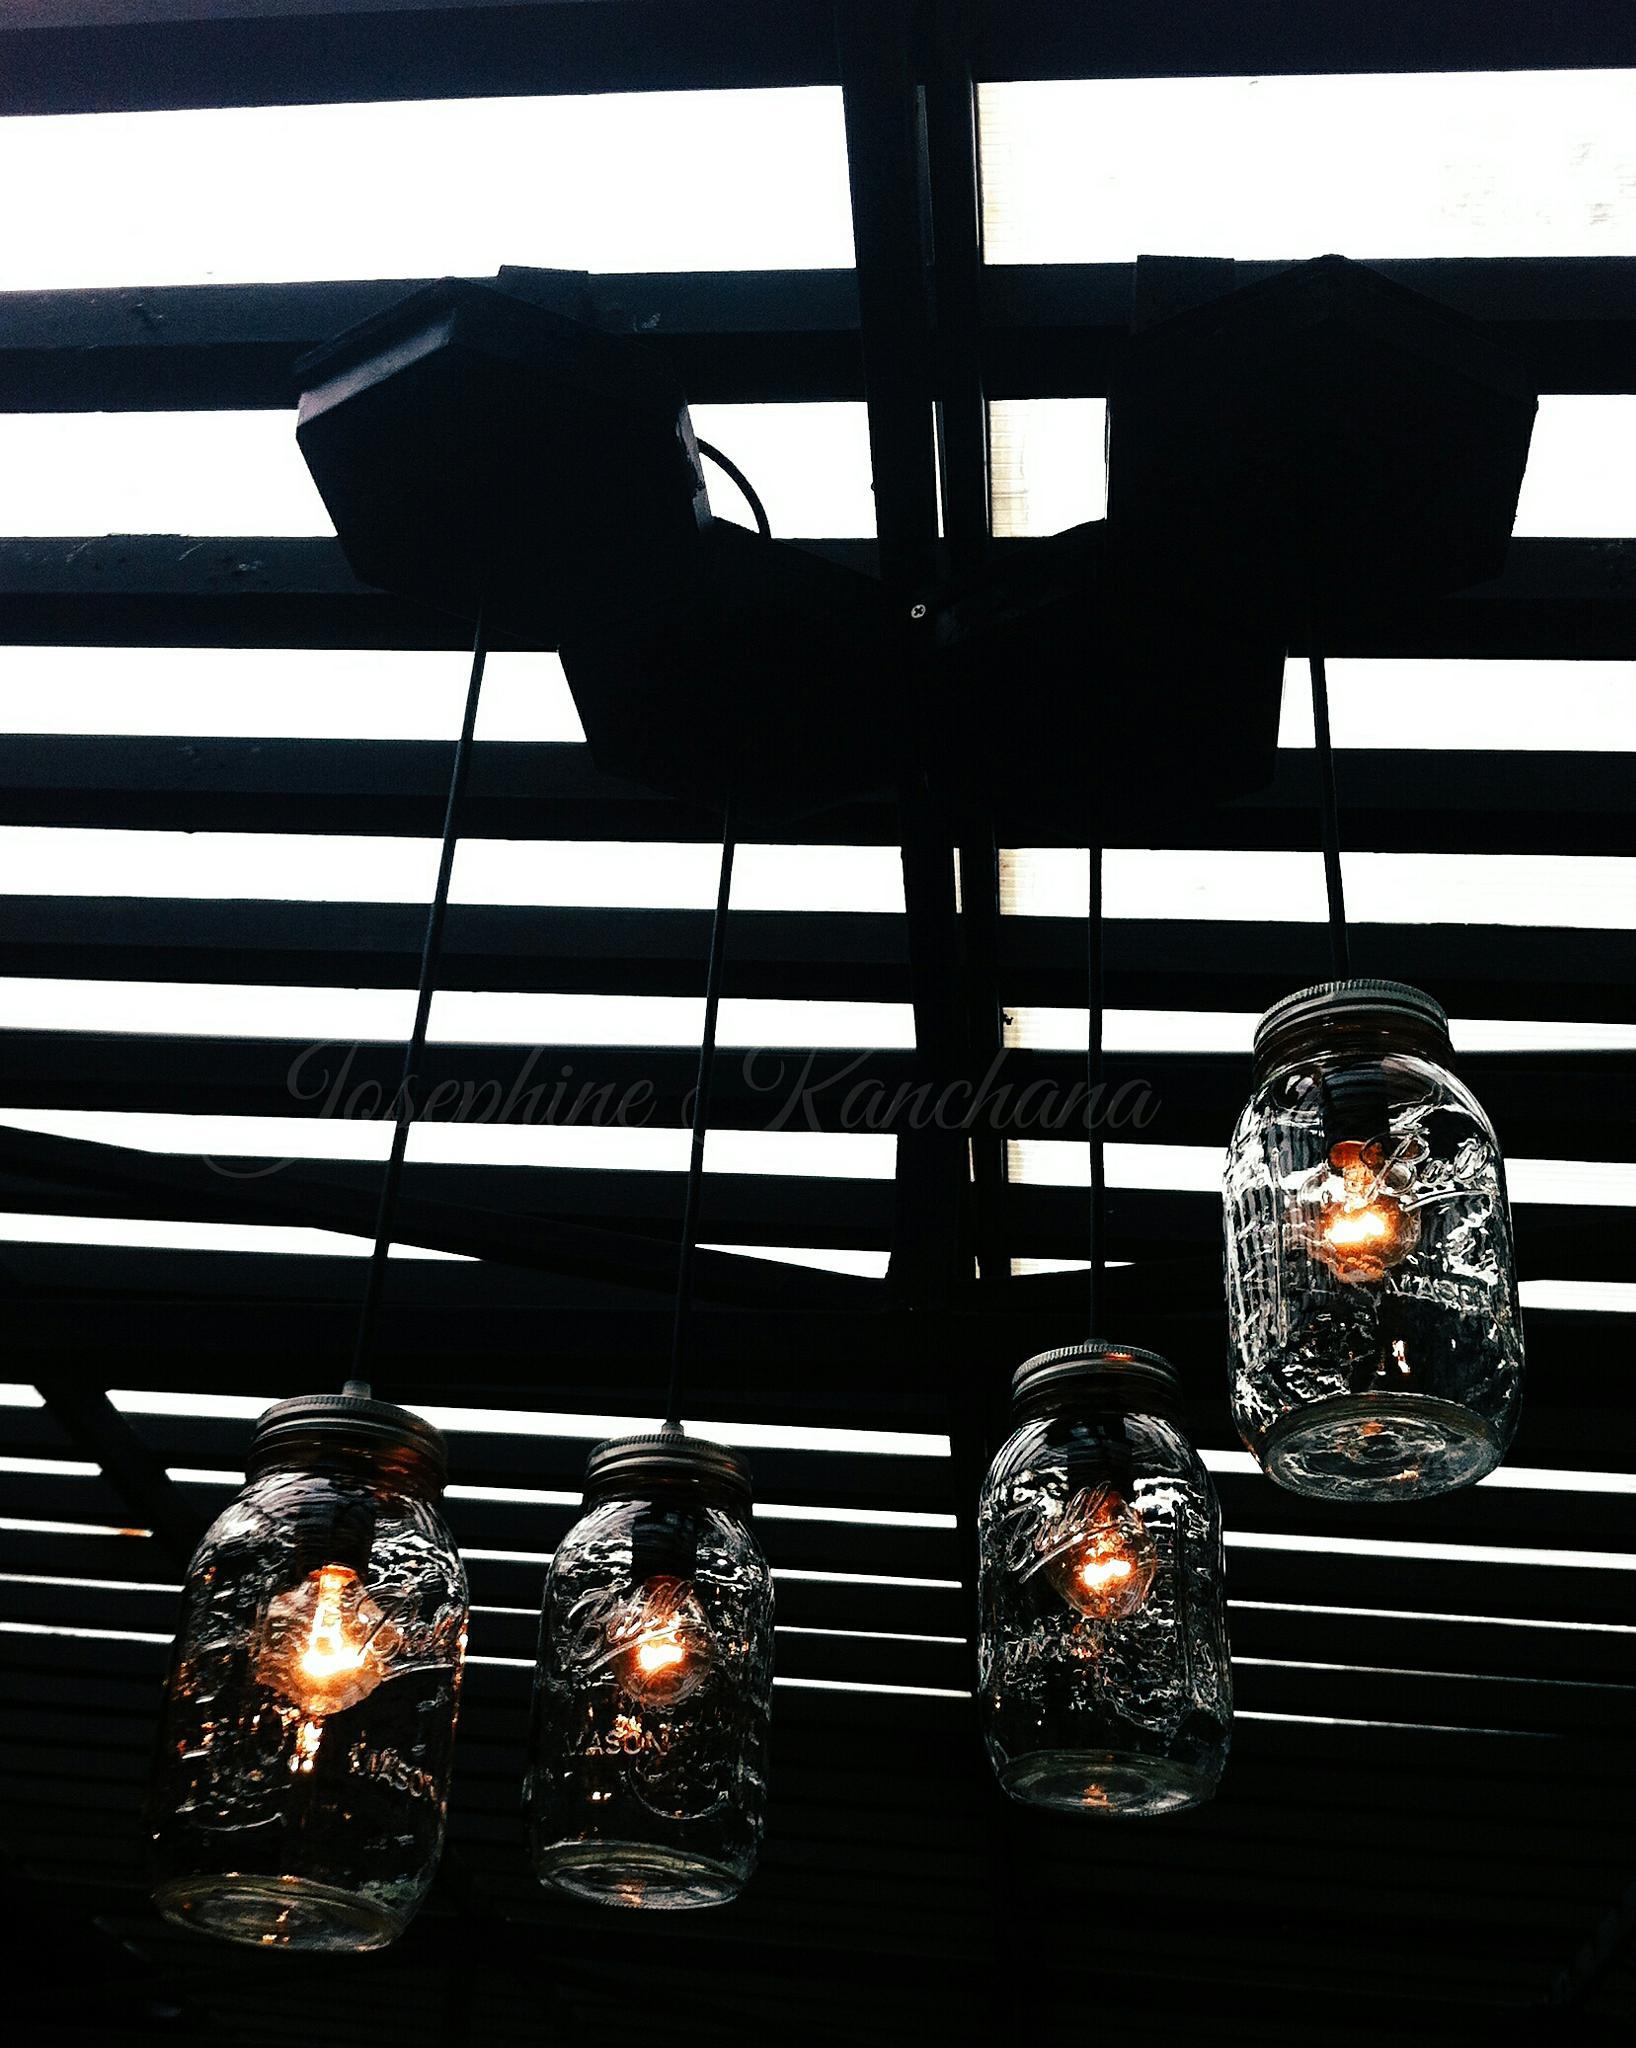 Dining lamp by Josephine Kanchana